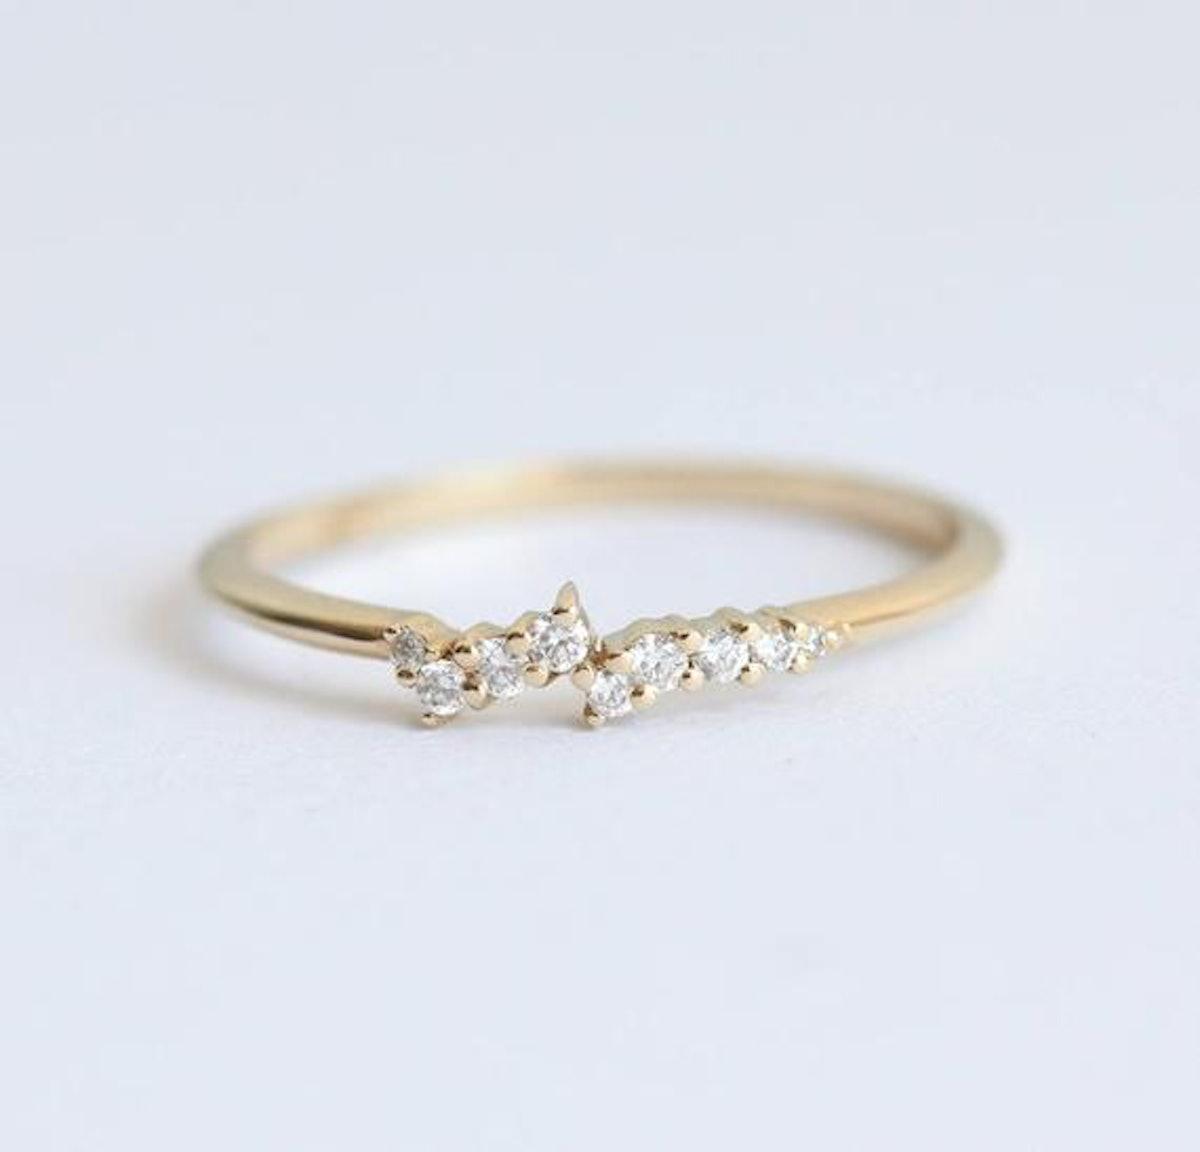 MinimalVS - Diamond Ring 14k Gold Cluster Ring